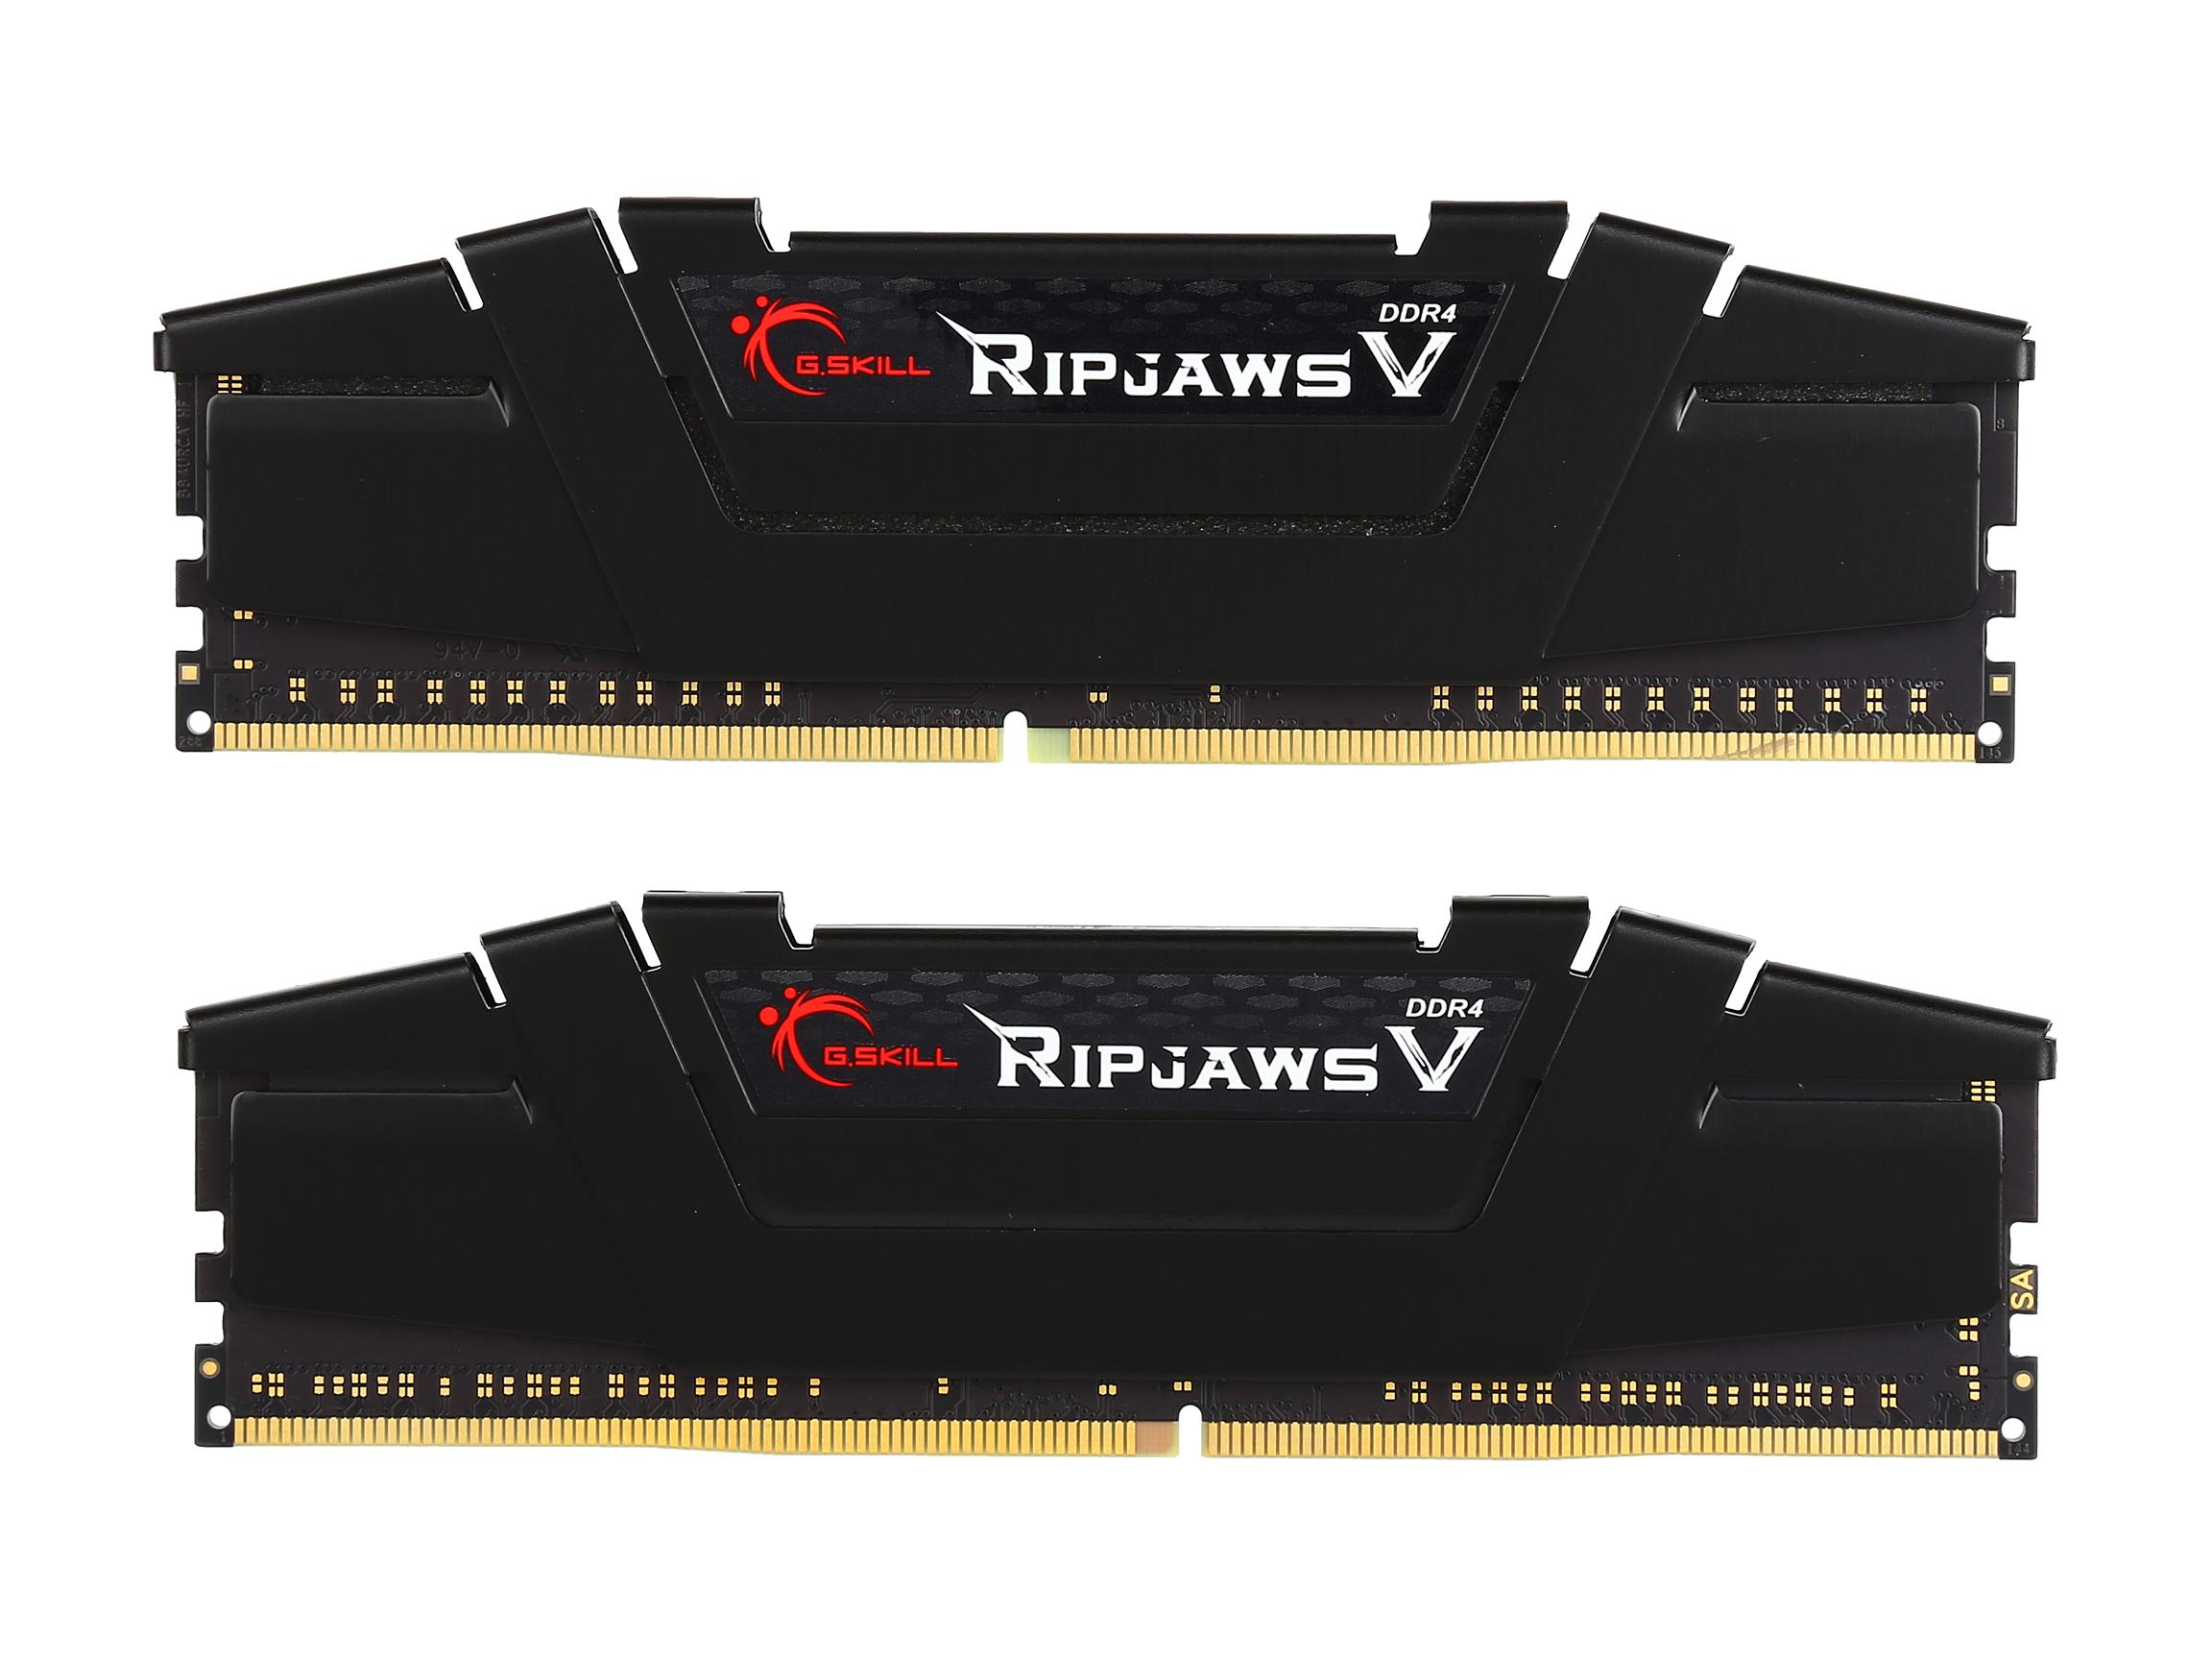 G.SKILL Ripjaws V Series 16GB (2 x 8GB) 288-Pin DDR4 SDRAM DDR4 3200 Memory F4-3200C16D-16GVKB